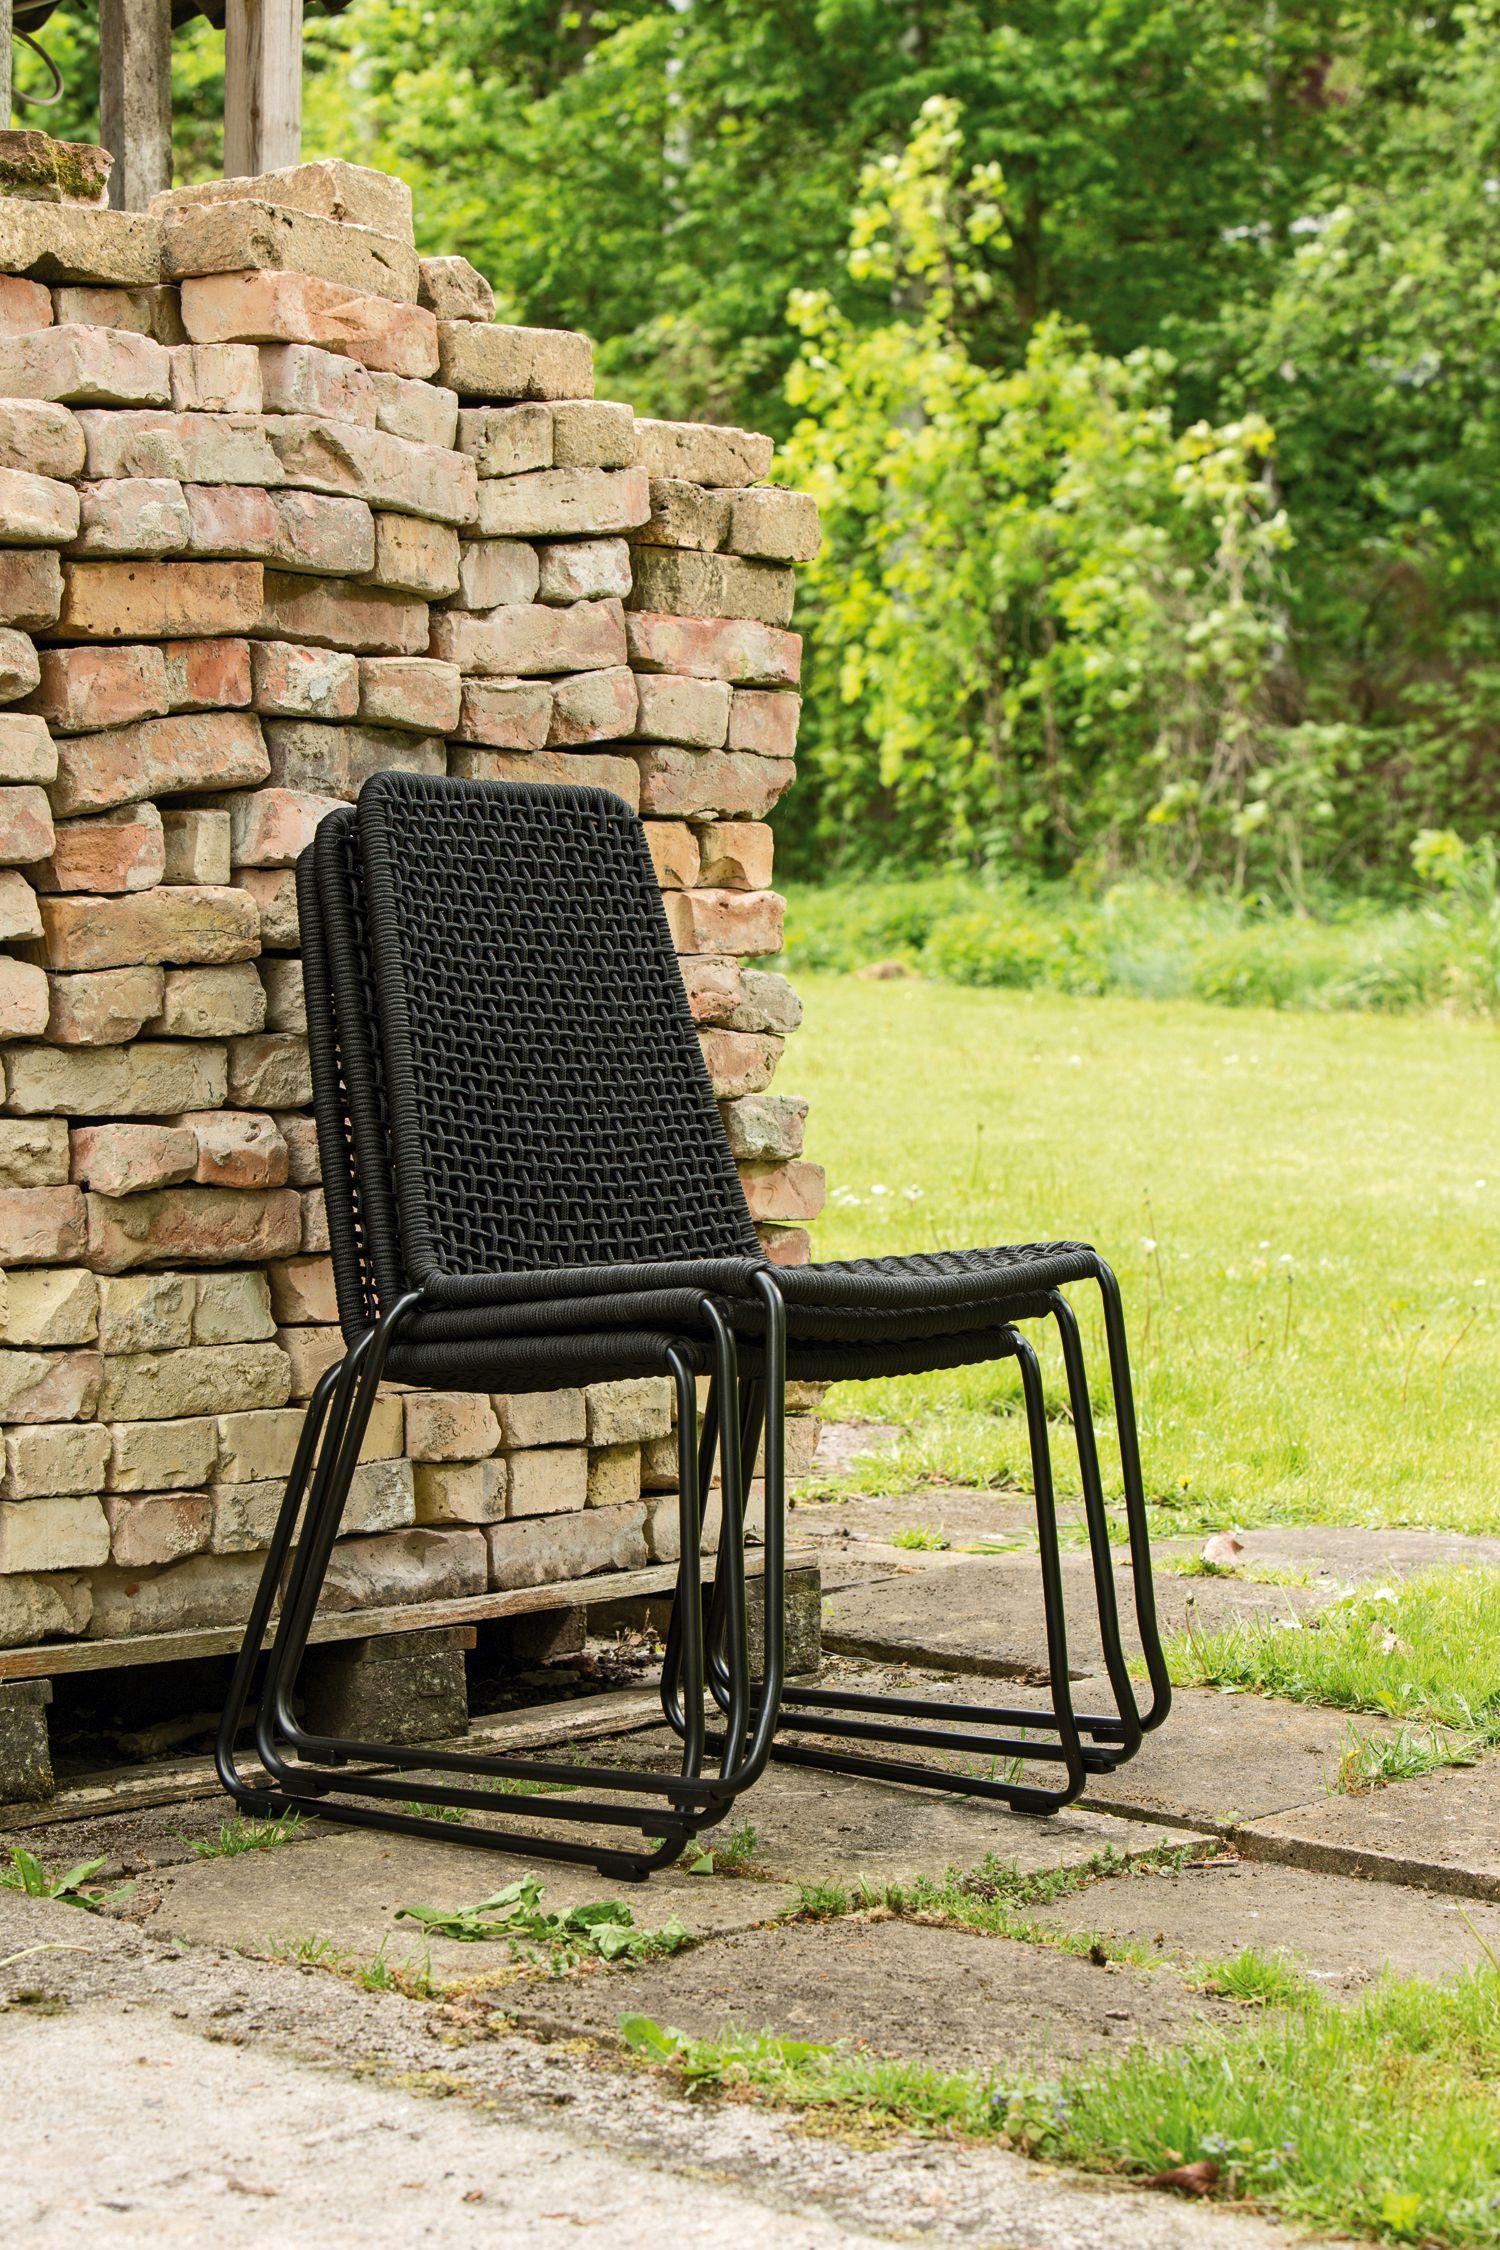 lambert patti outdoorstuhl stapelbar schwarz grau. Black Bedroom Furniture Sets. Home Design Ideas